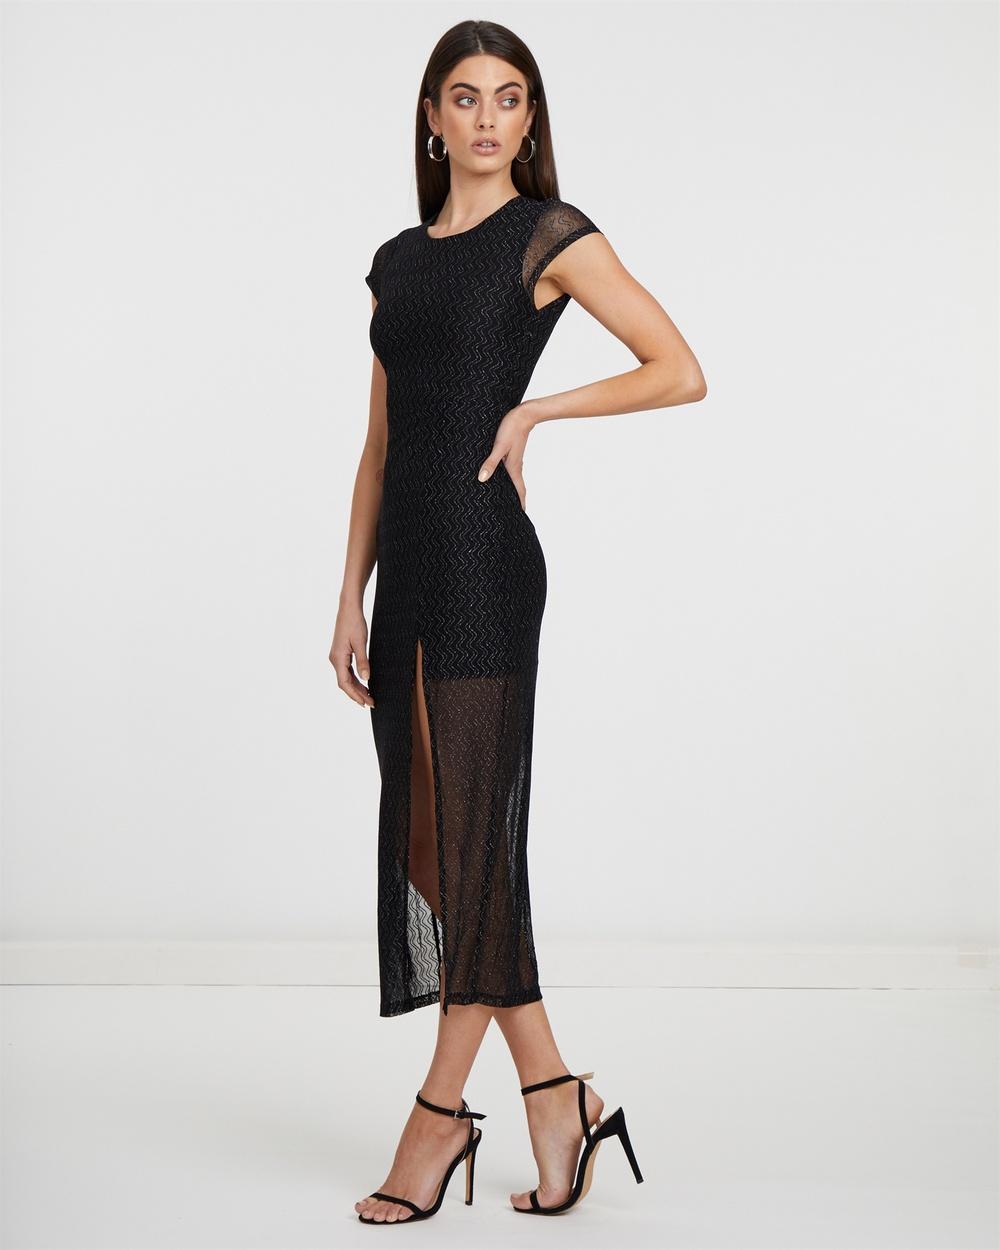 Atmos & Here Black Thigh High Split Dress